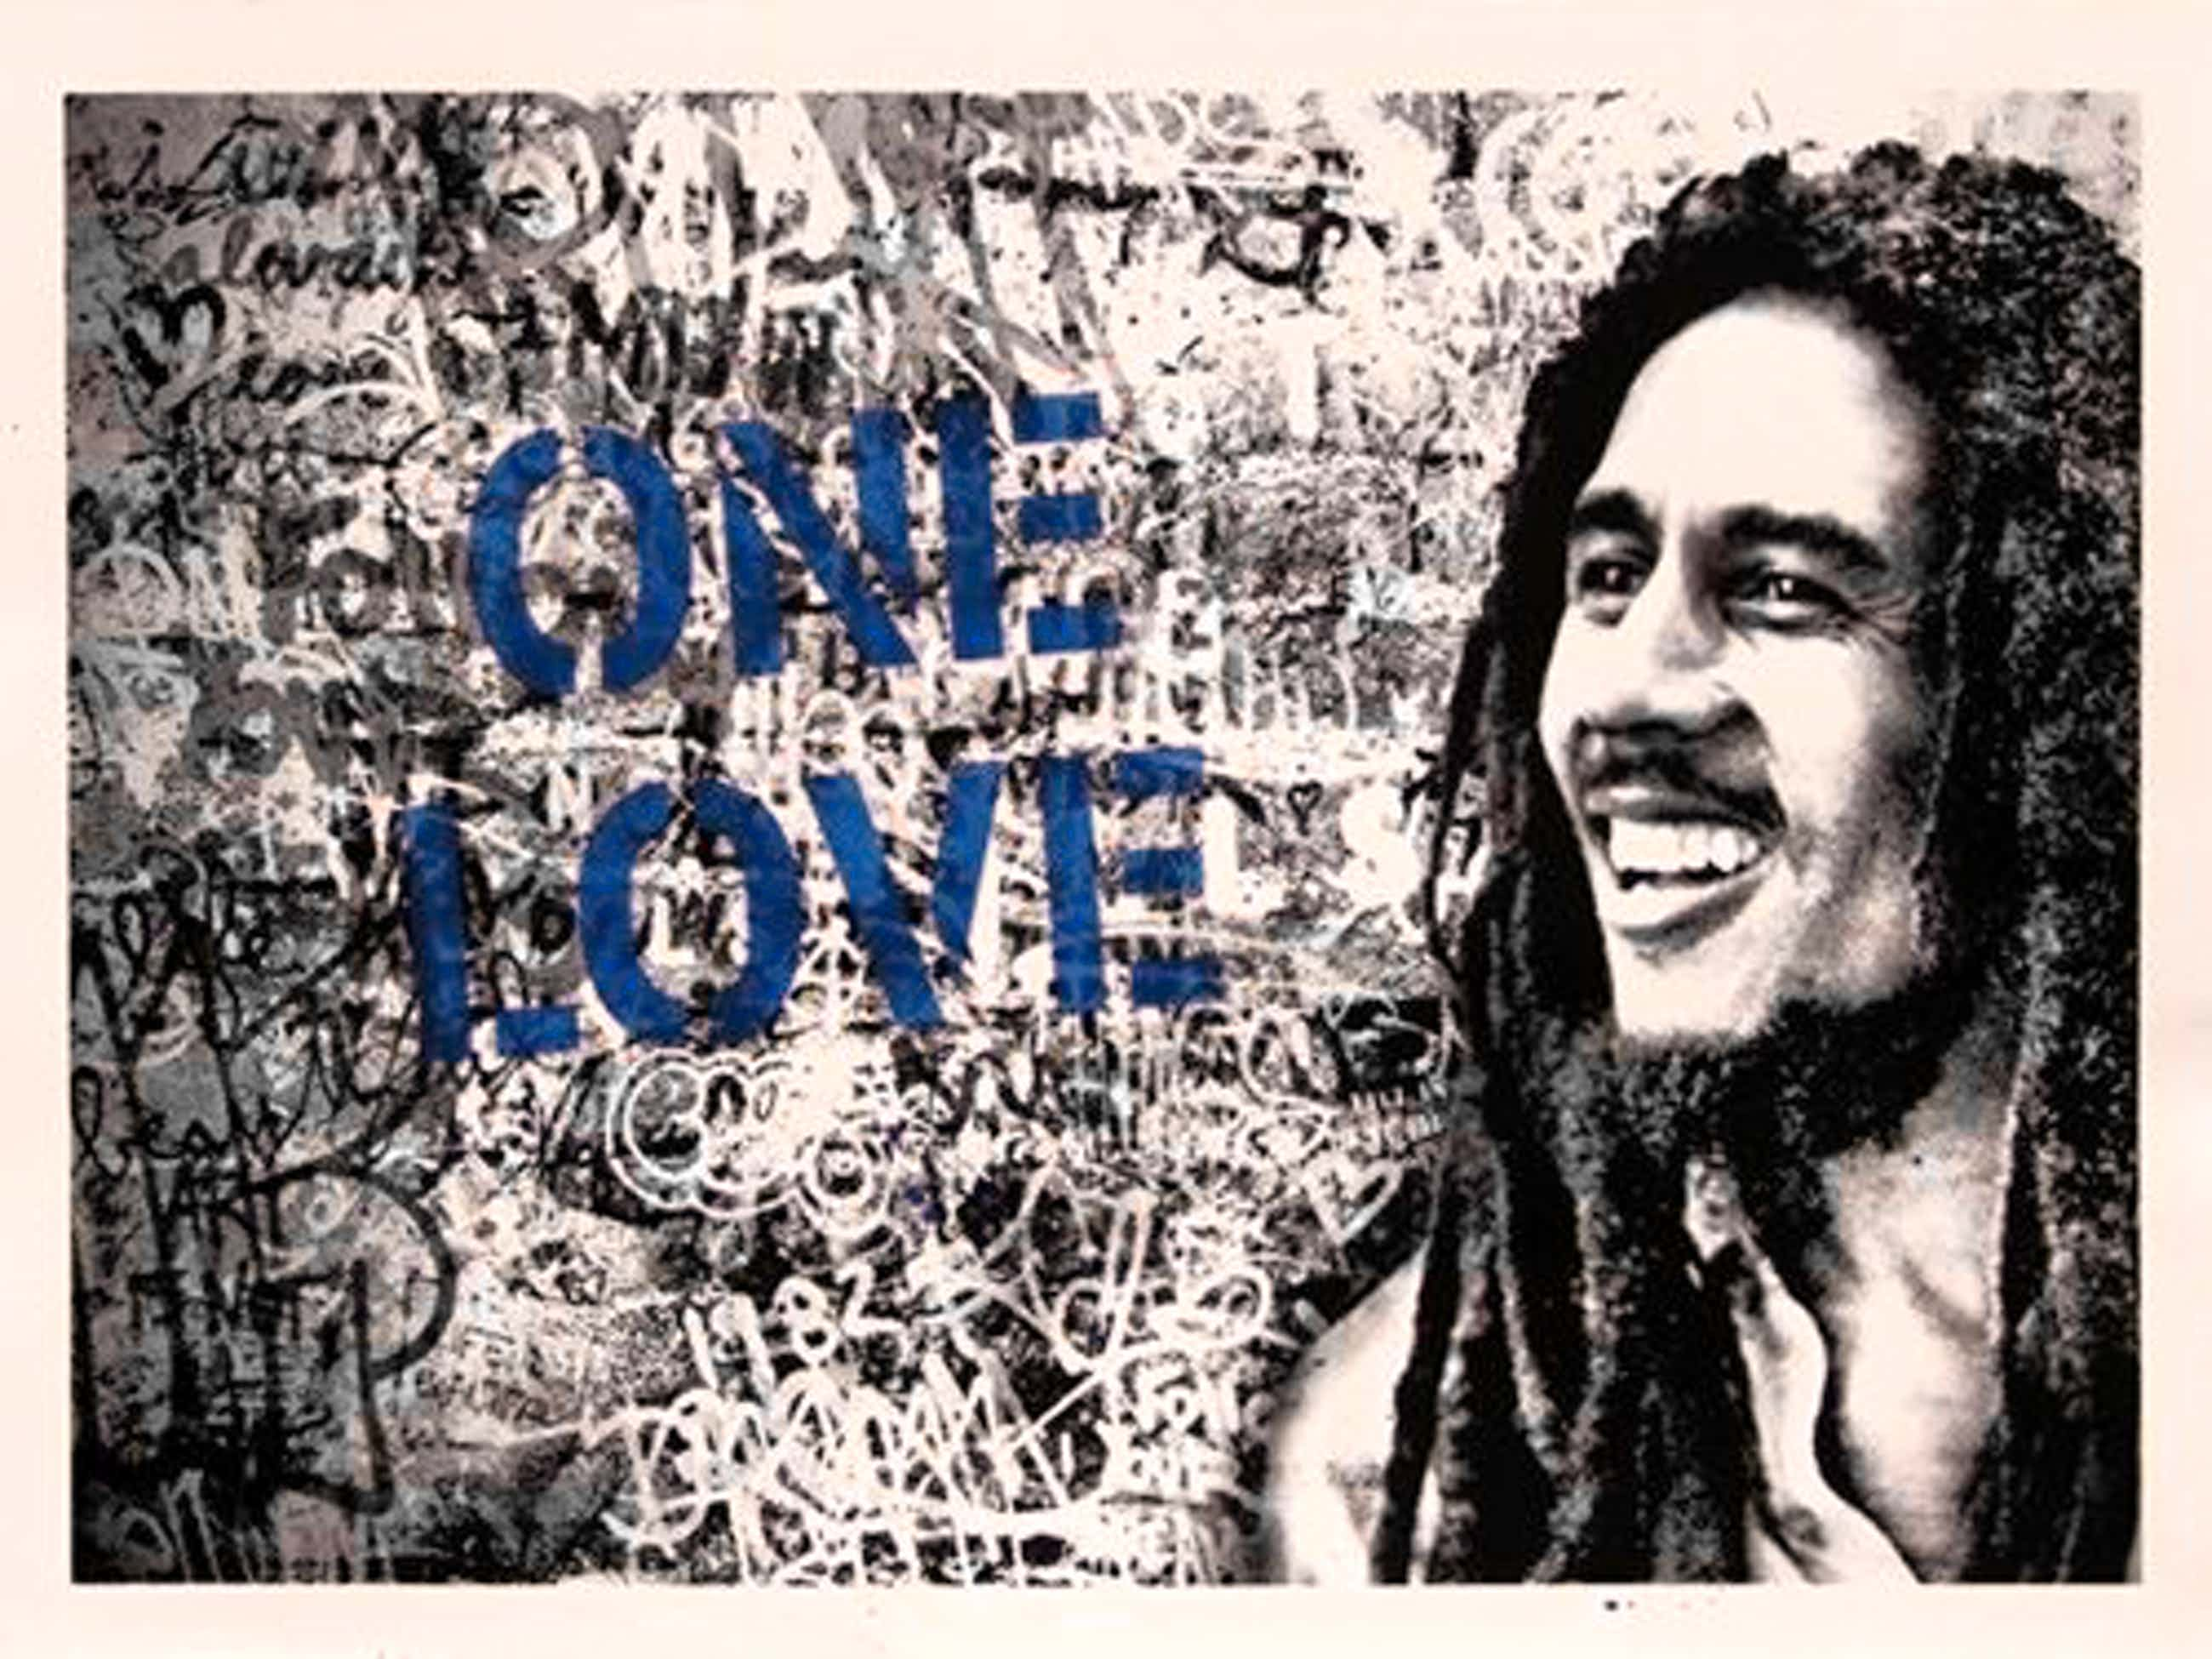 Mr. Brainwash - Happy Birthday Bob Marley kopen? Bied vanaf 700!